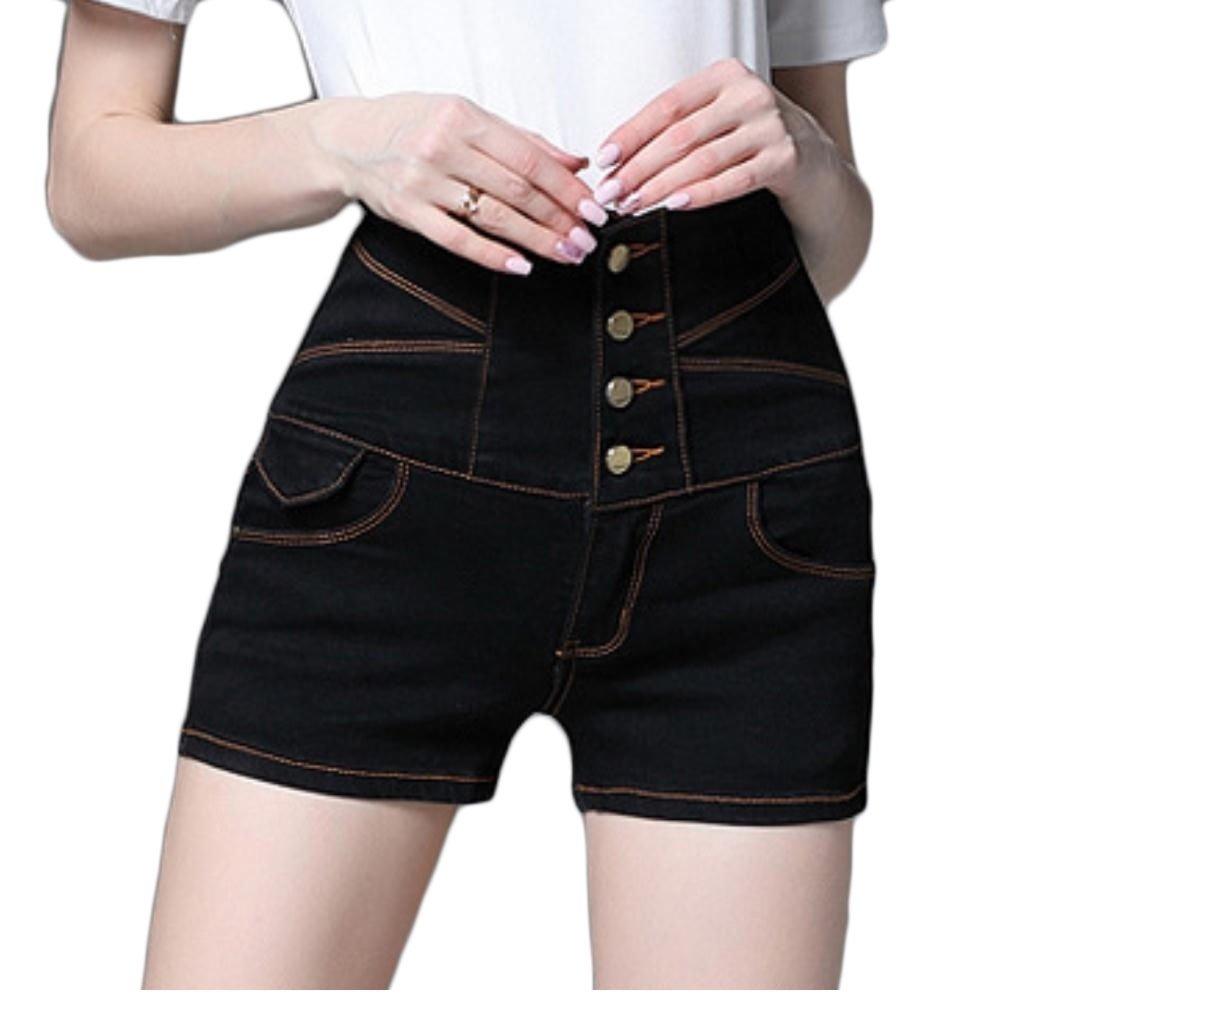 Vska Womens Sexy High Waist Plus Size Slim Fashion All-Match Jean Shorts Black S